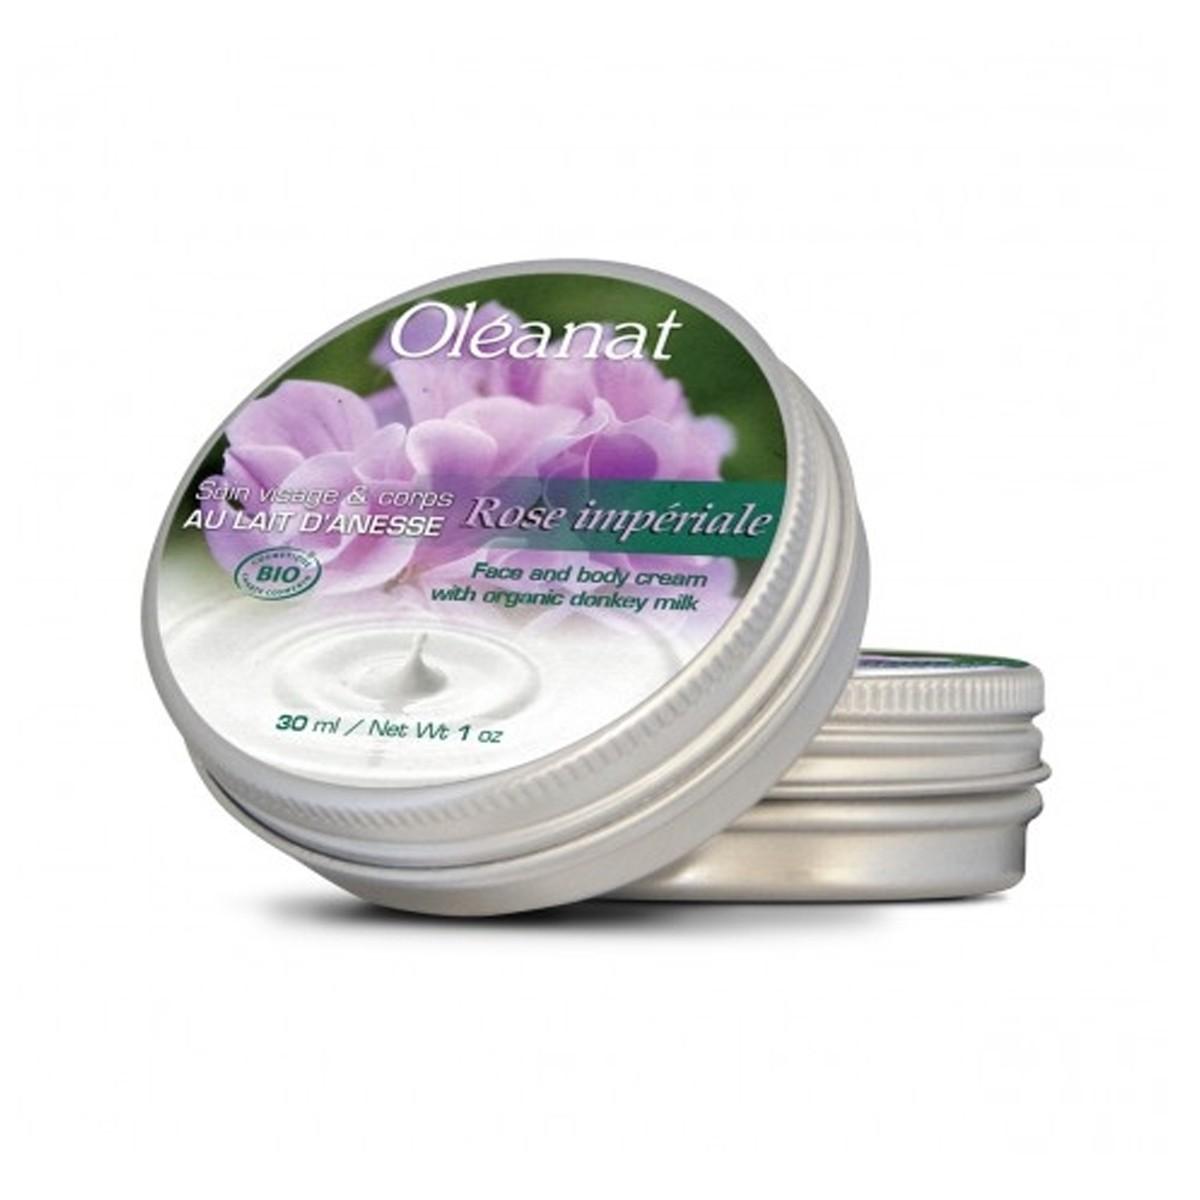 Oléanat Organic Moisturiser Donkey Butter Milk & Rose